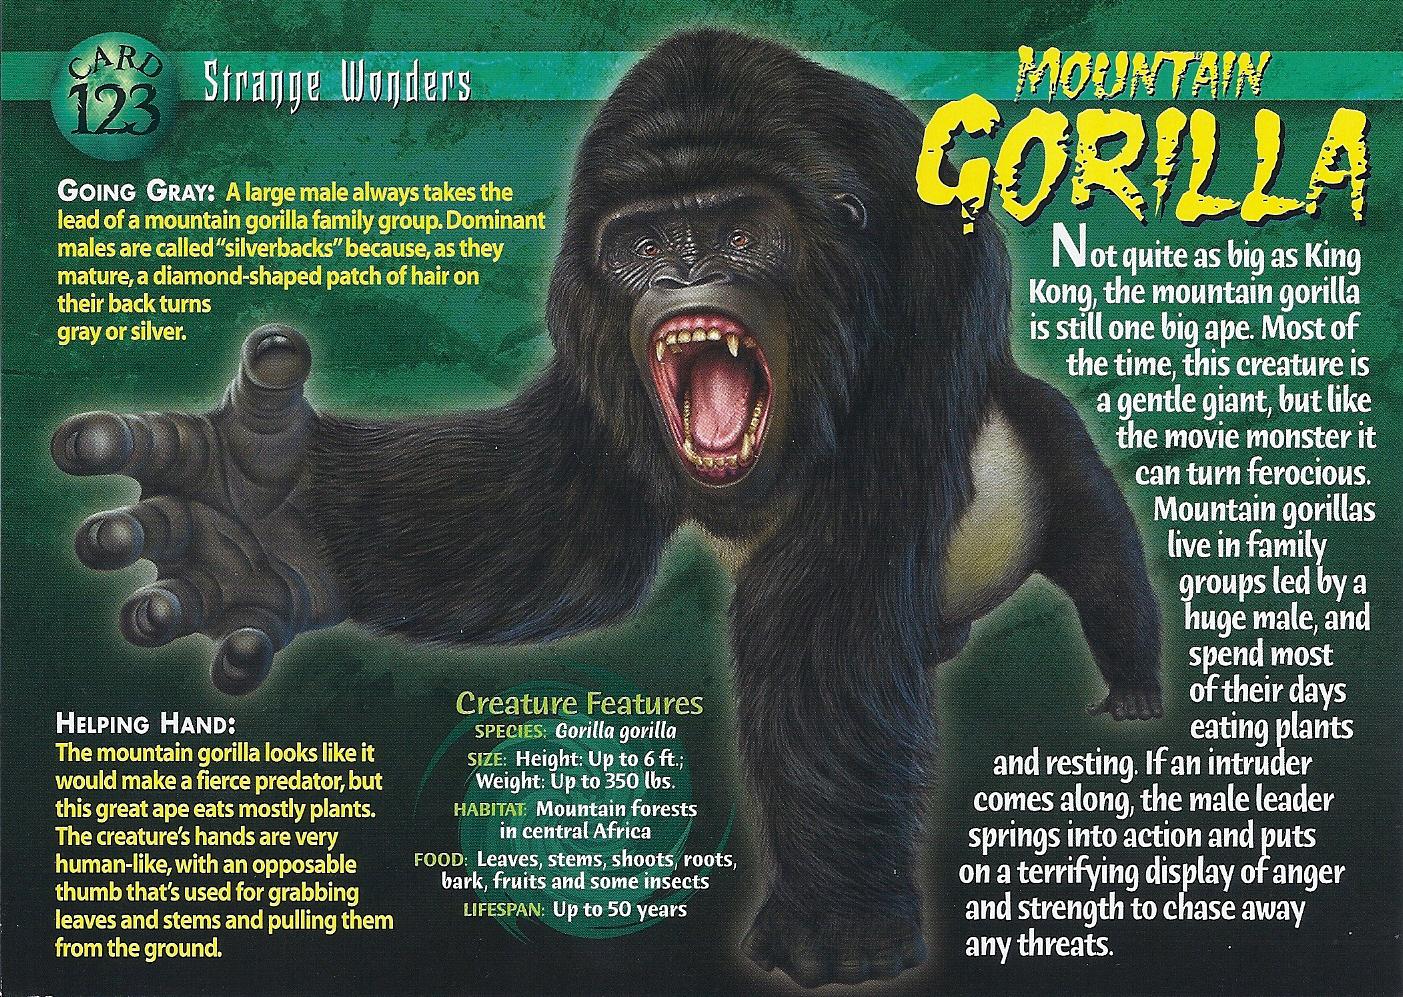 Mountain gorilla strange wonders card 123 front